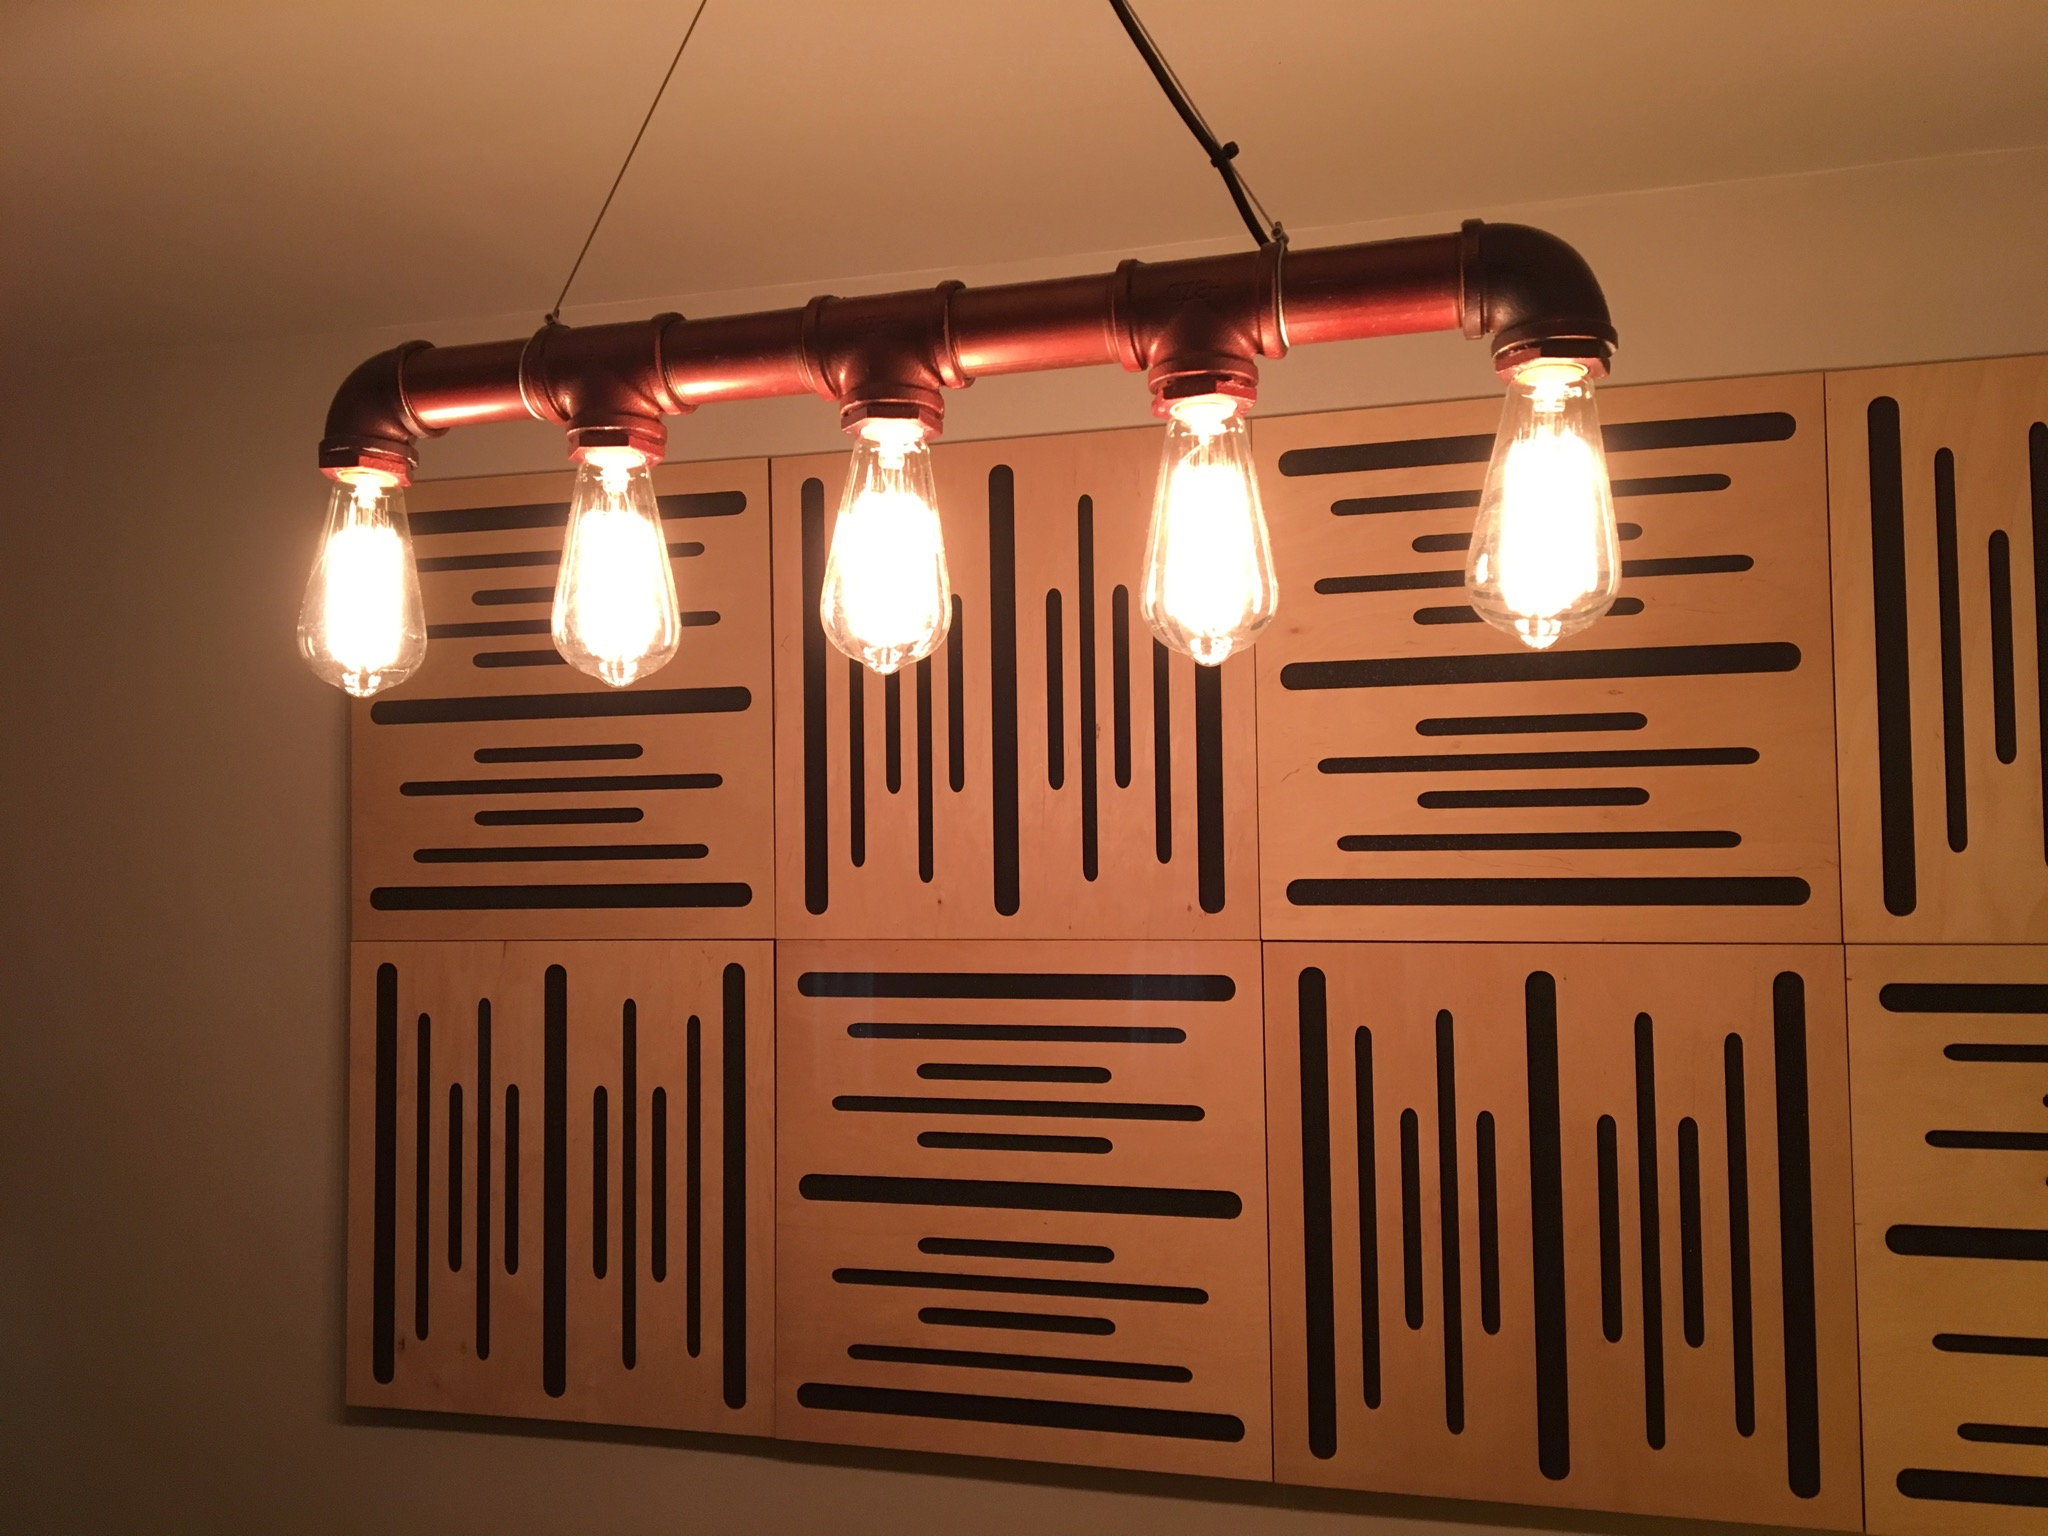 Studio-Build-Electrics10.jpg